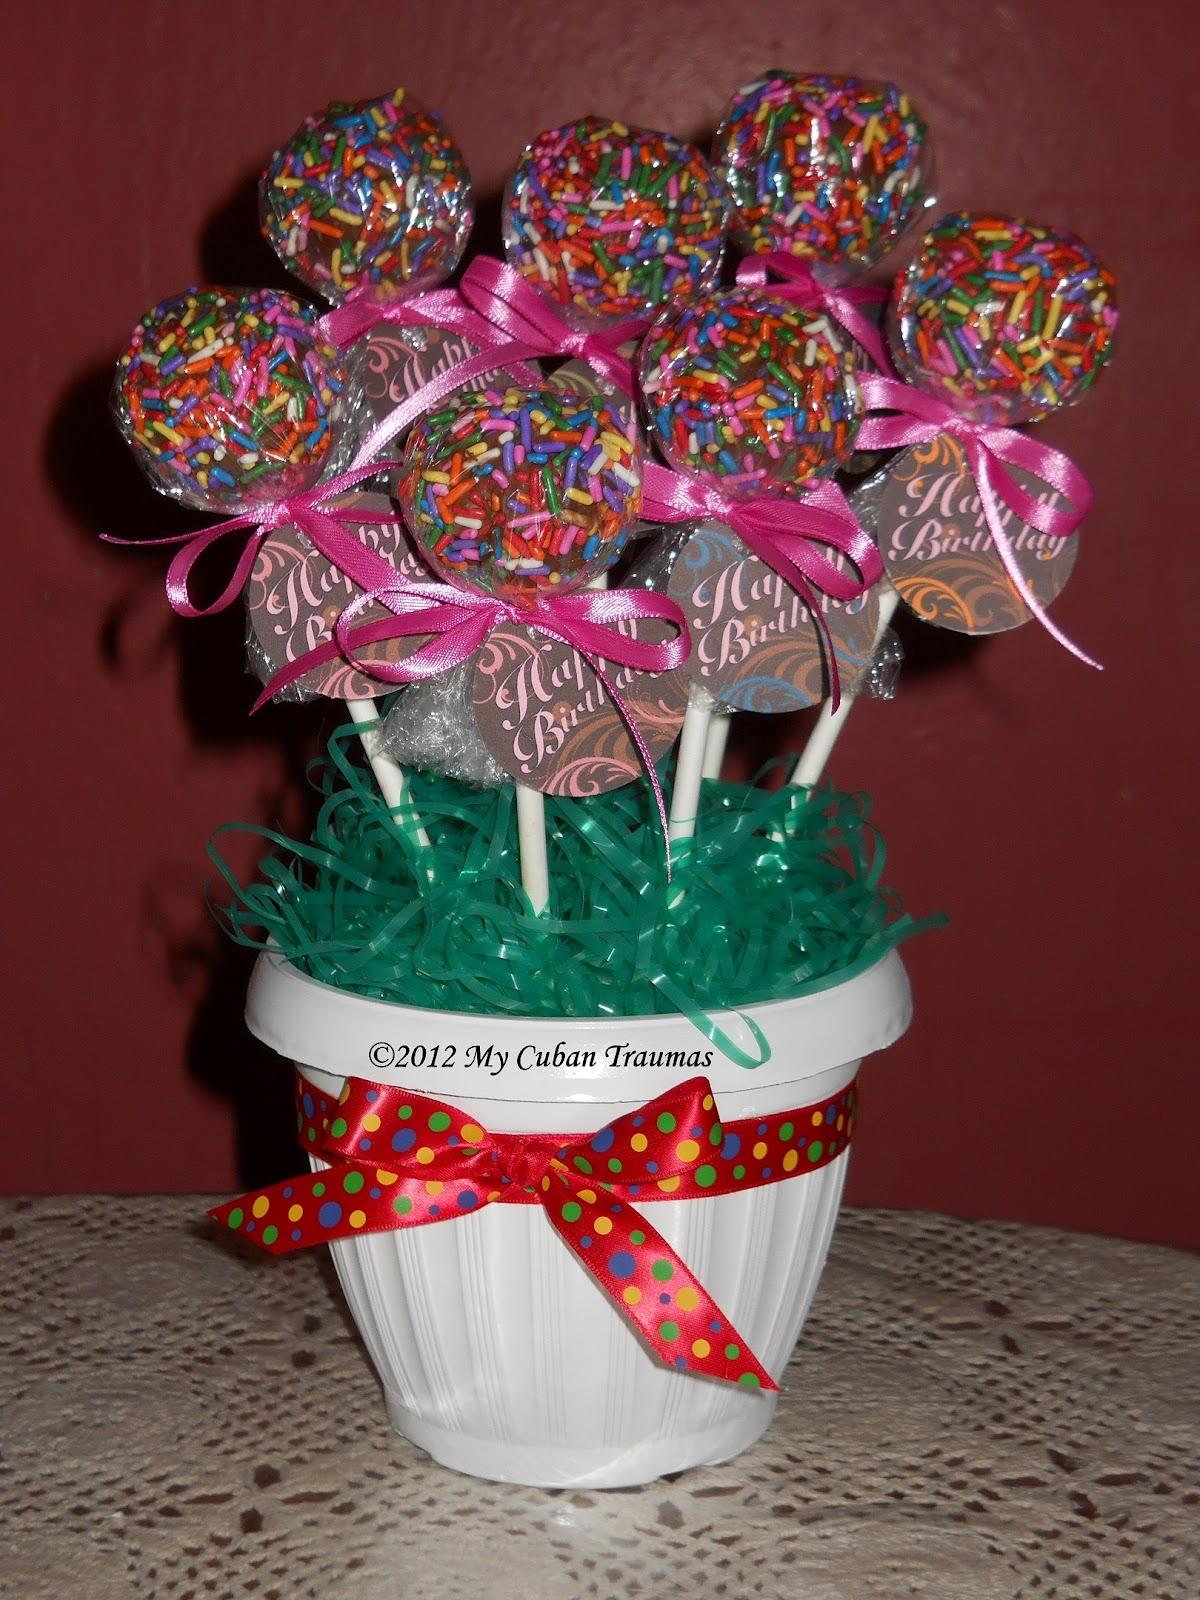 Cake Pops Without Sticks